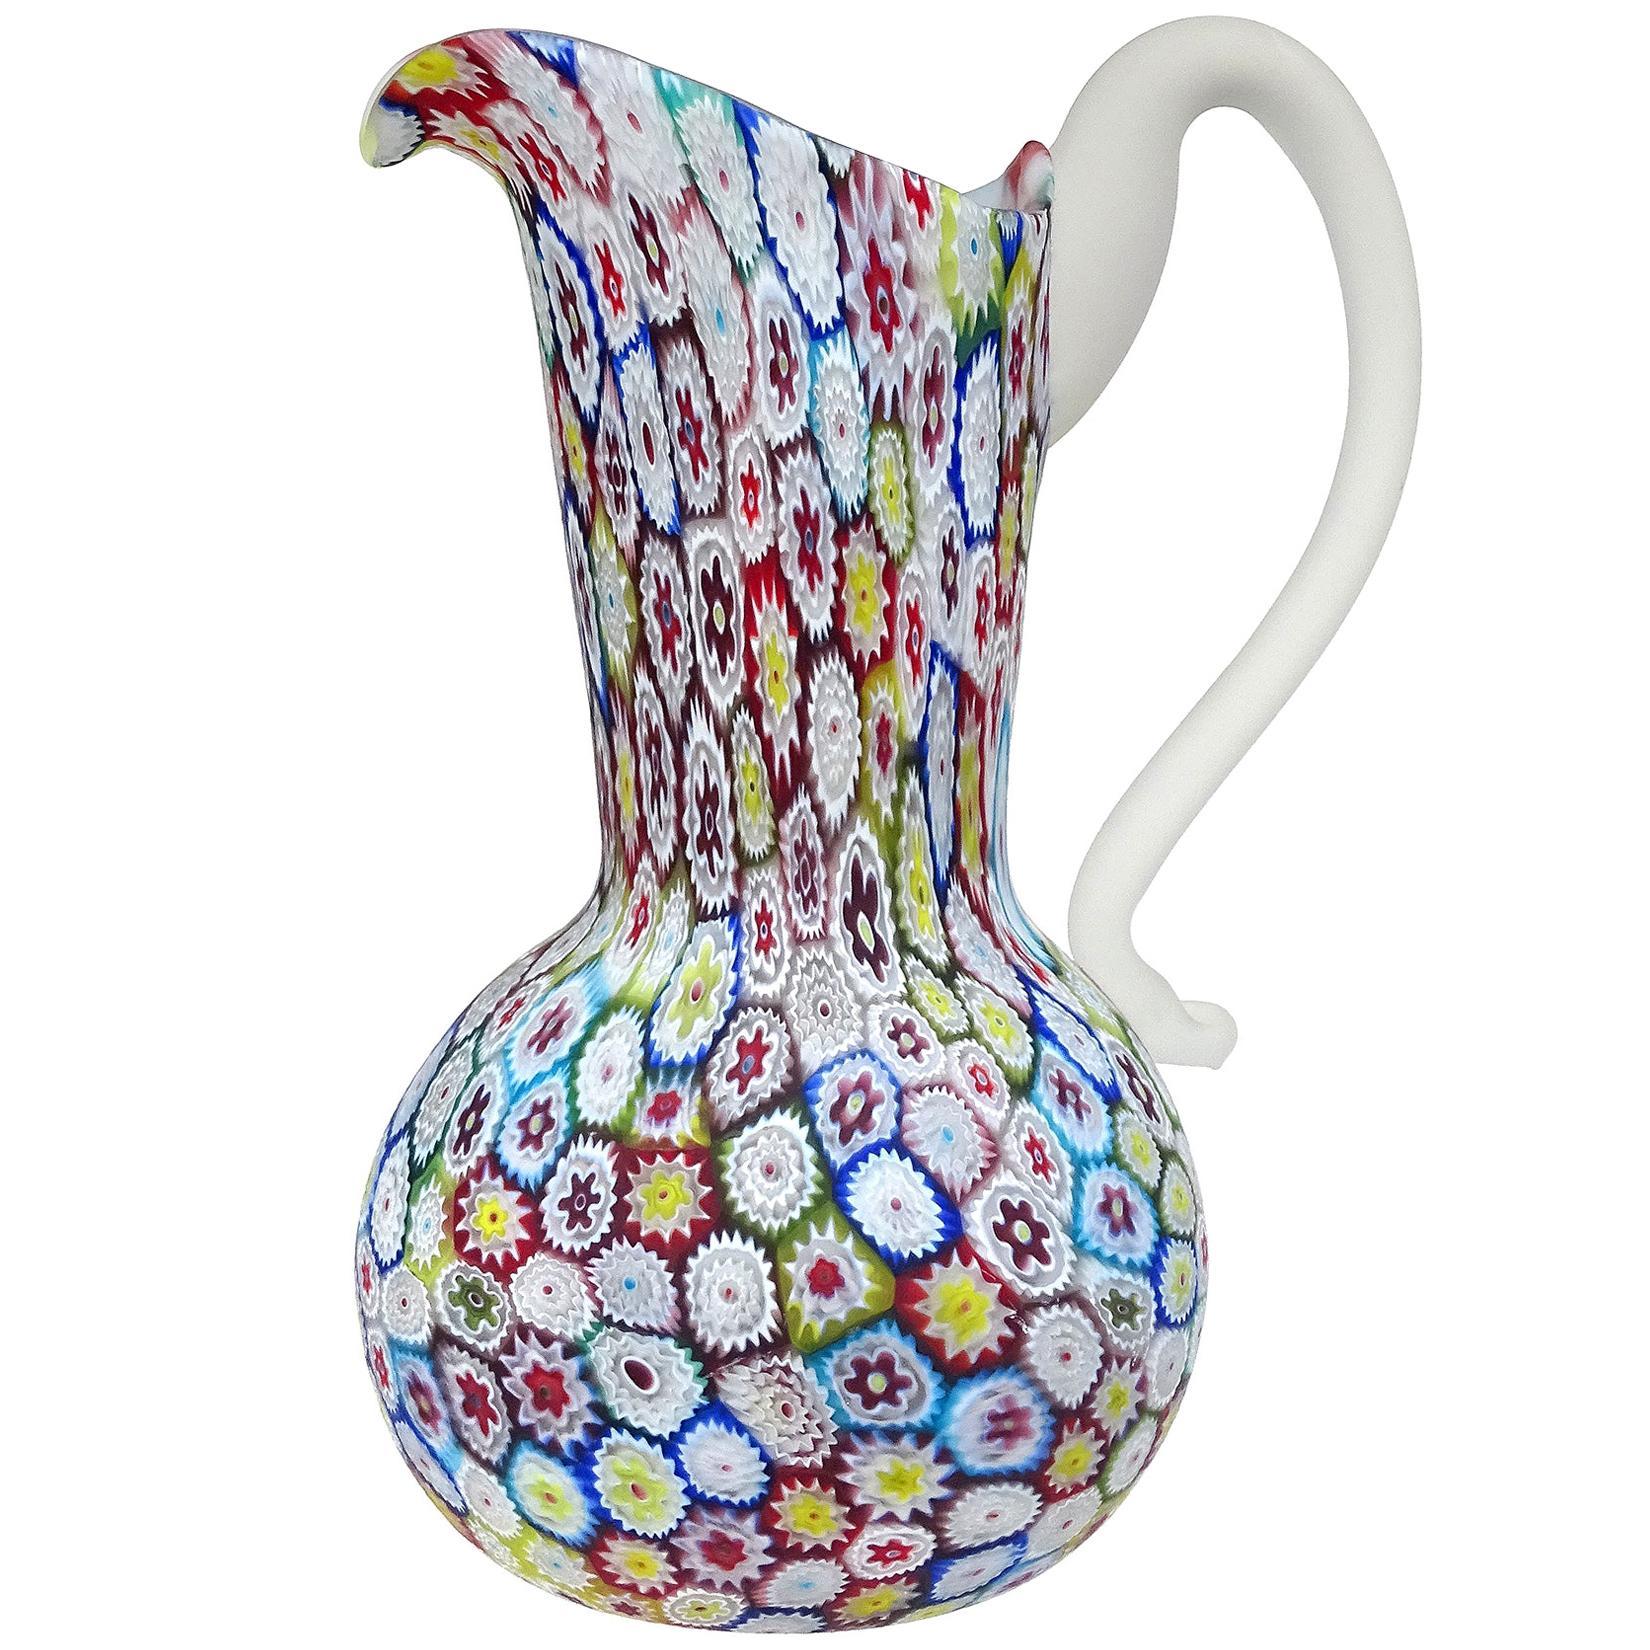 Fratelli Toso Murano Millefiori Flower Mosaic Italian Art Glass Pitcher Vase